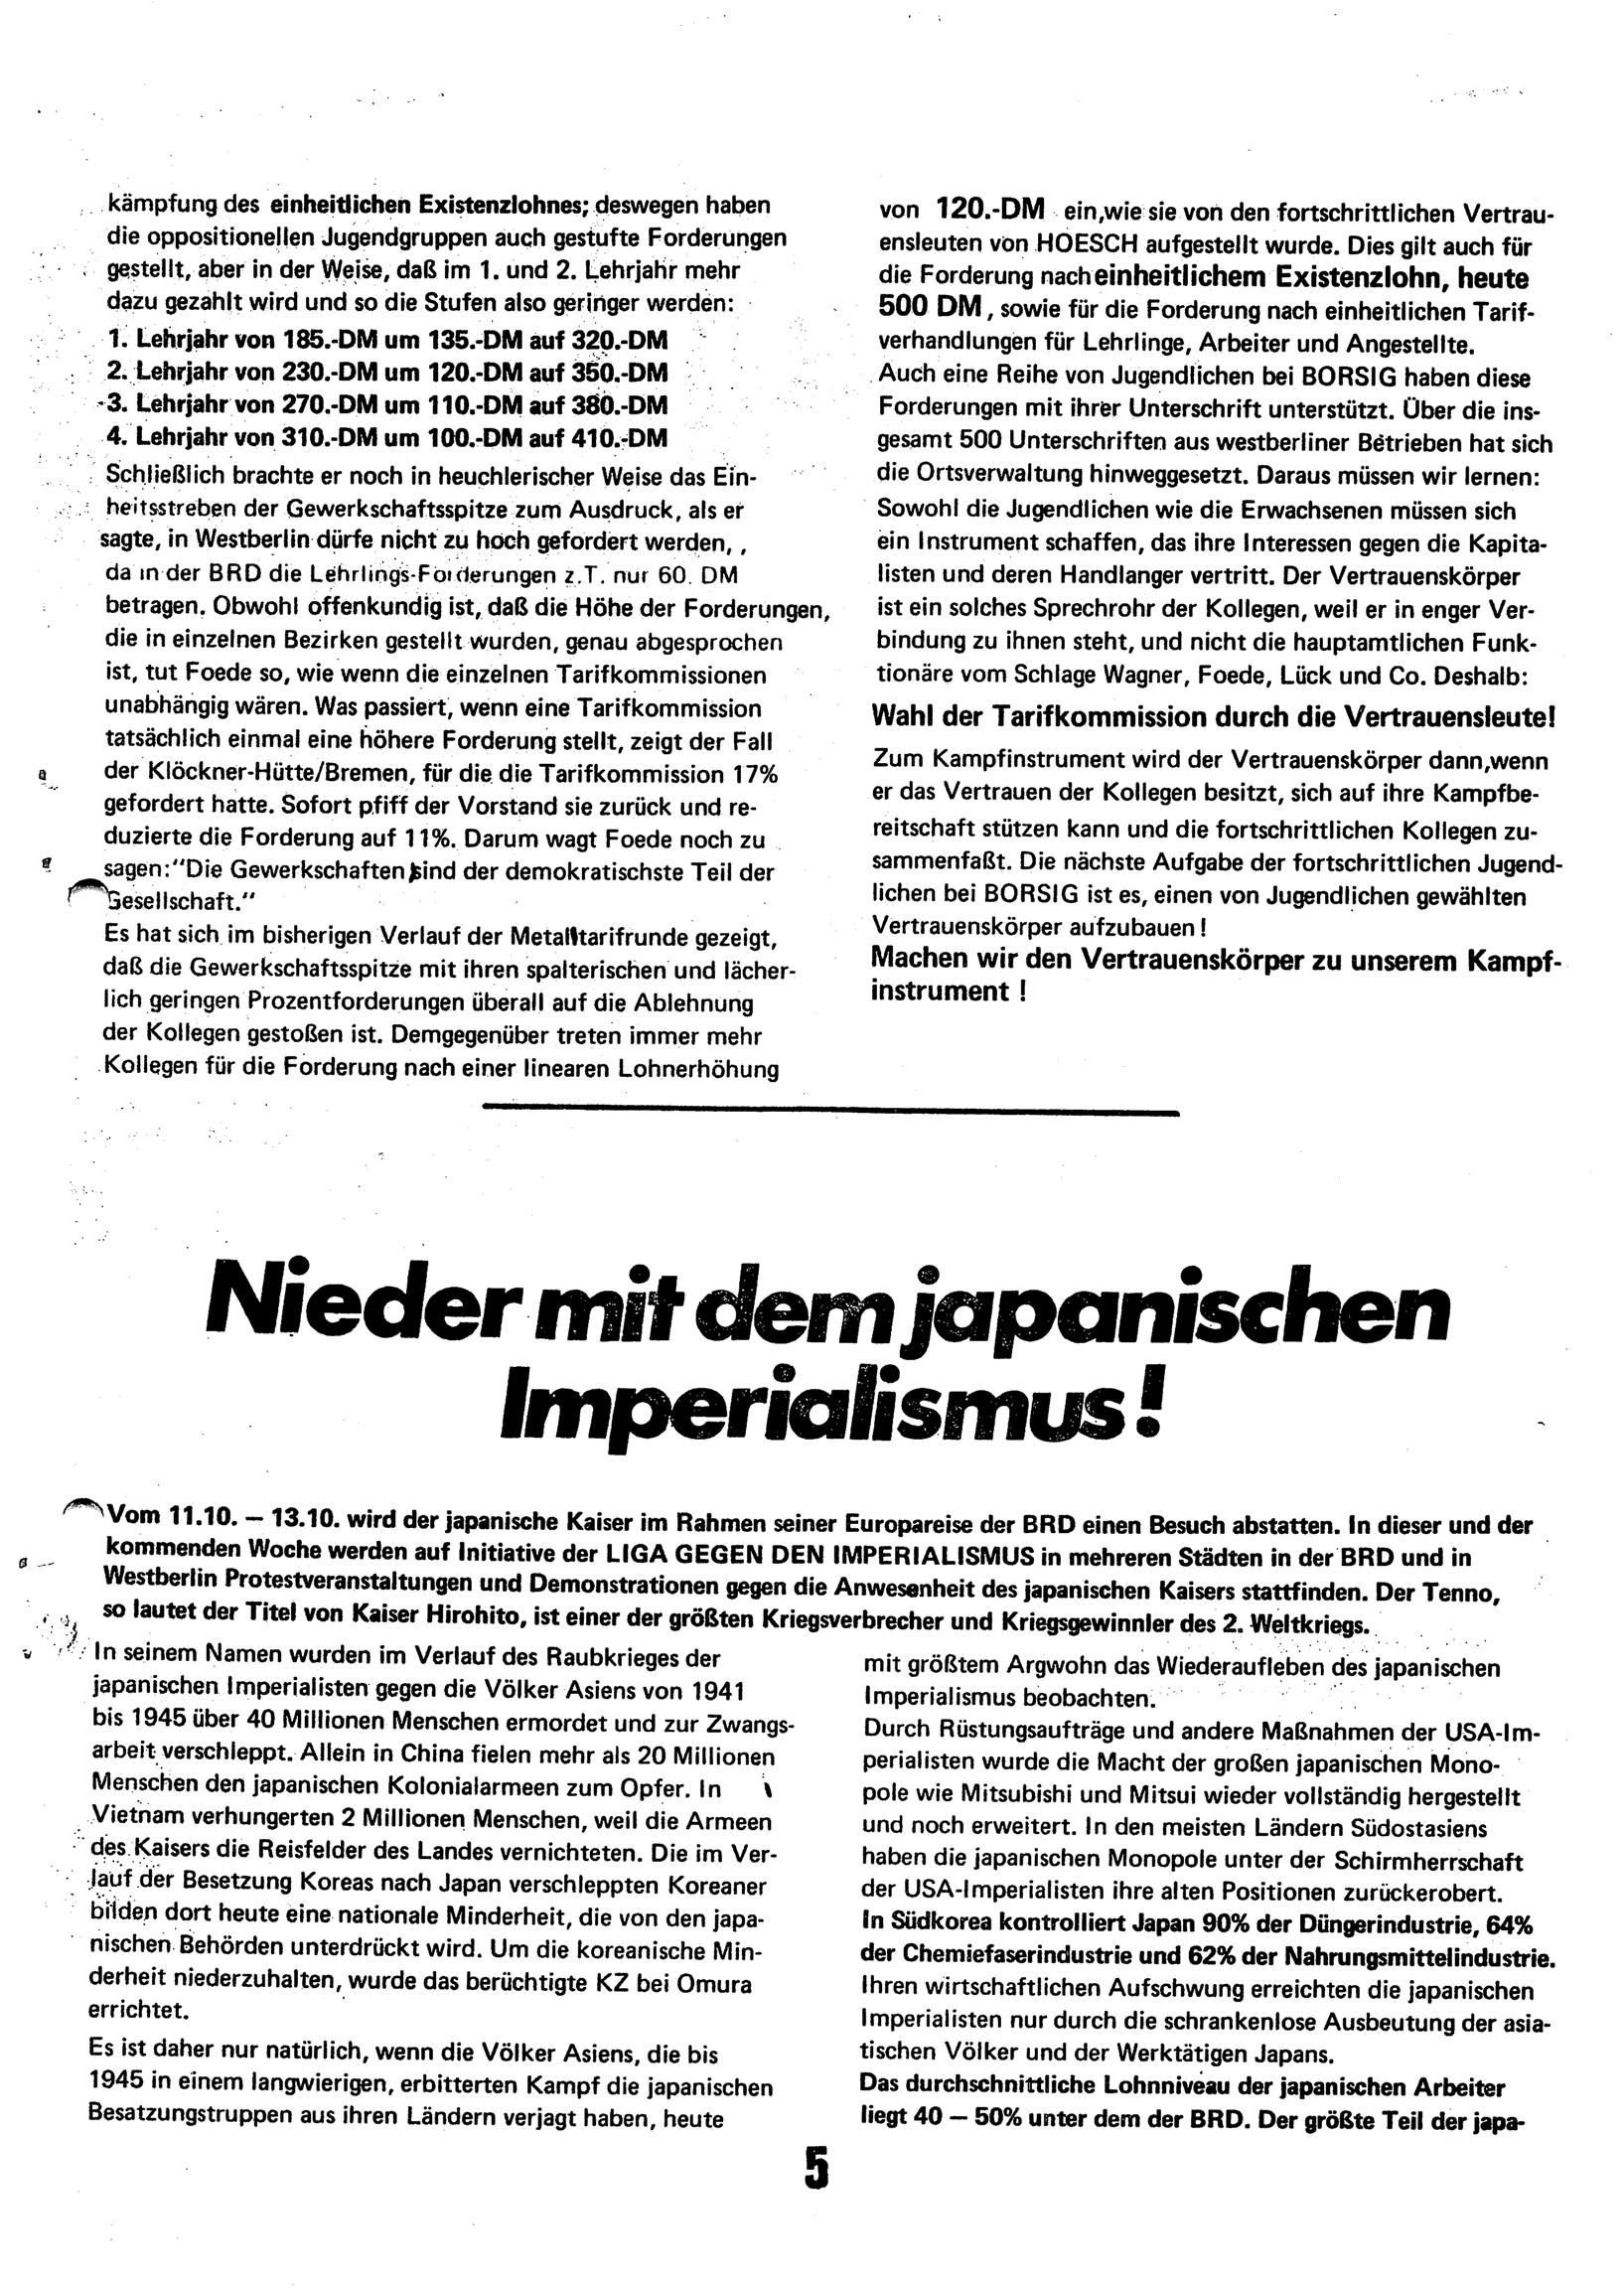 Berlin_Borsig312